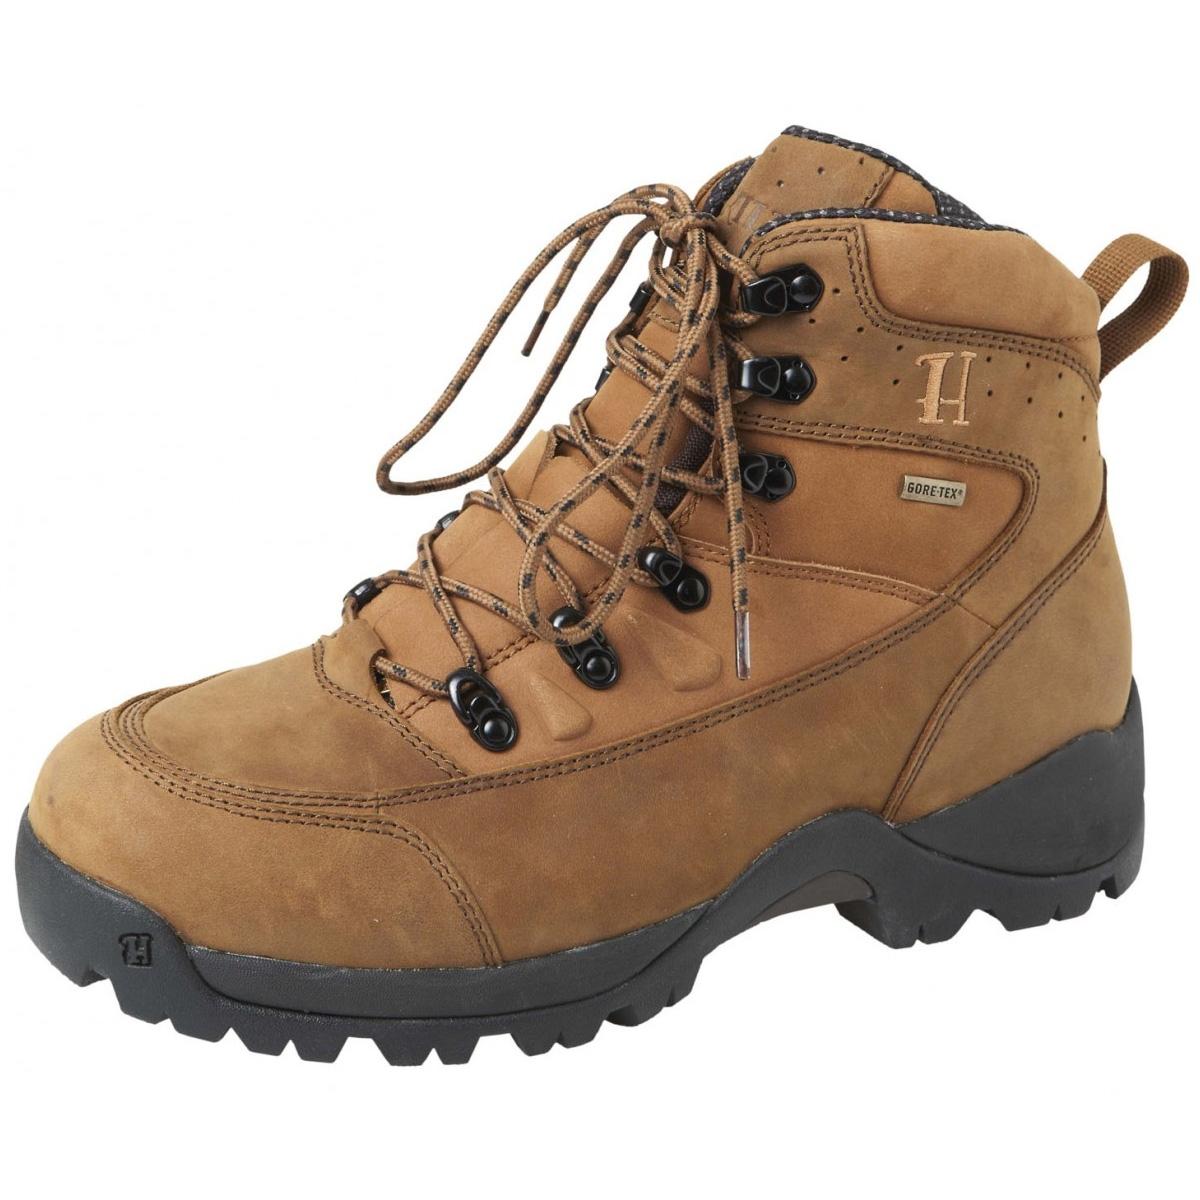 0330b540d81 Image of Harkila Big Game GTX 6 Inch Walking Boot (Men's) - Light Brown